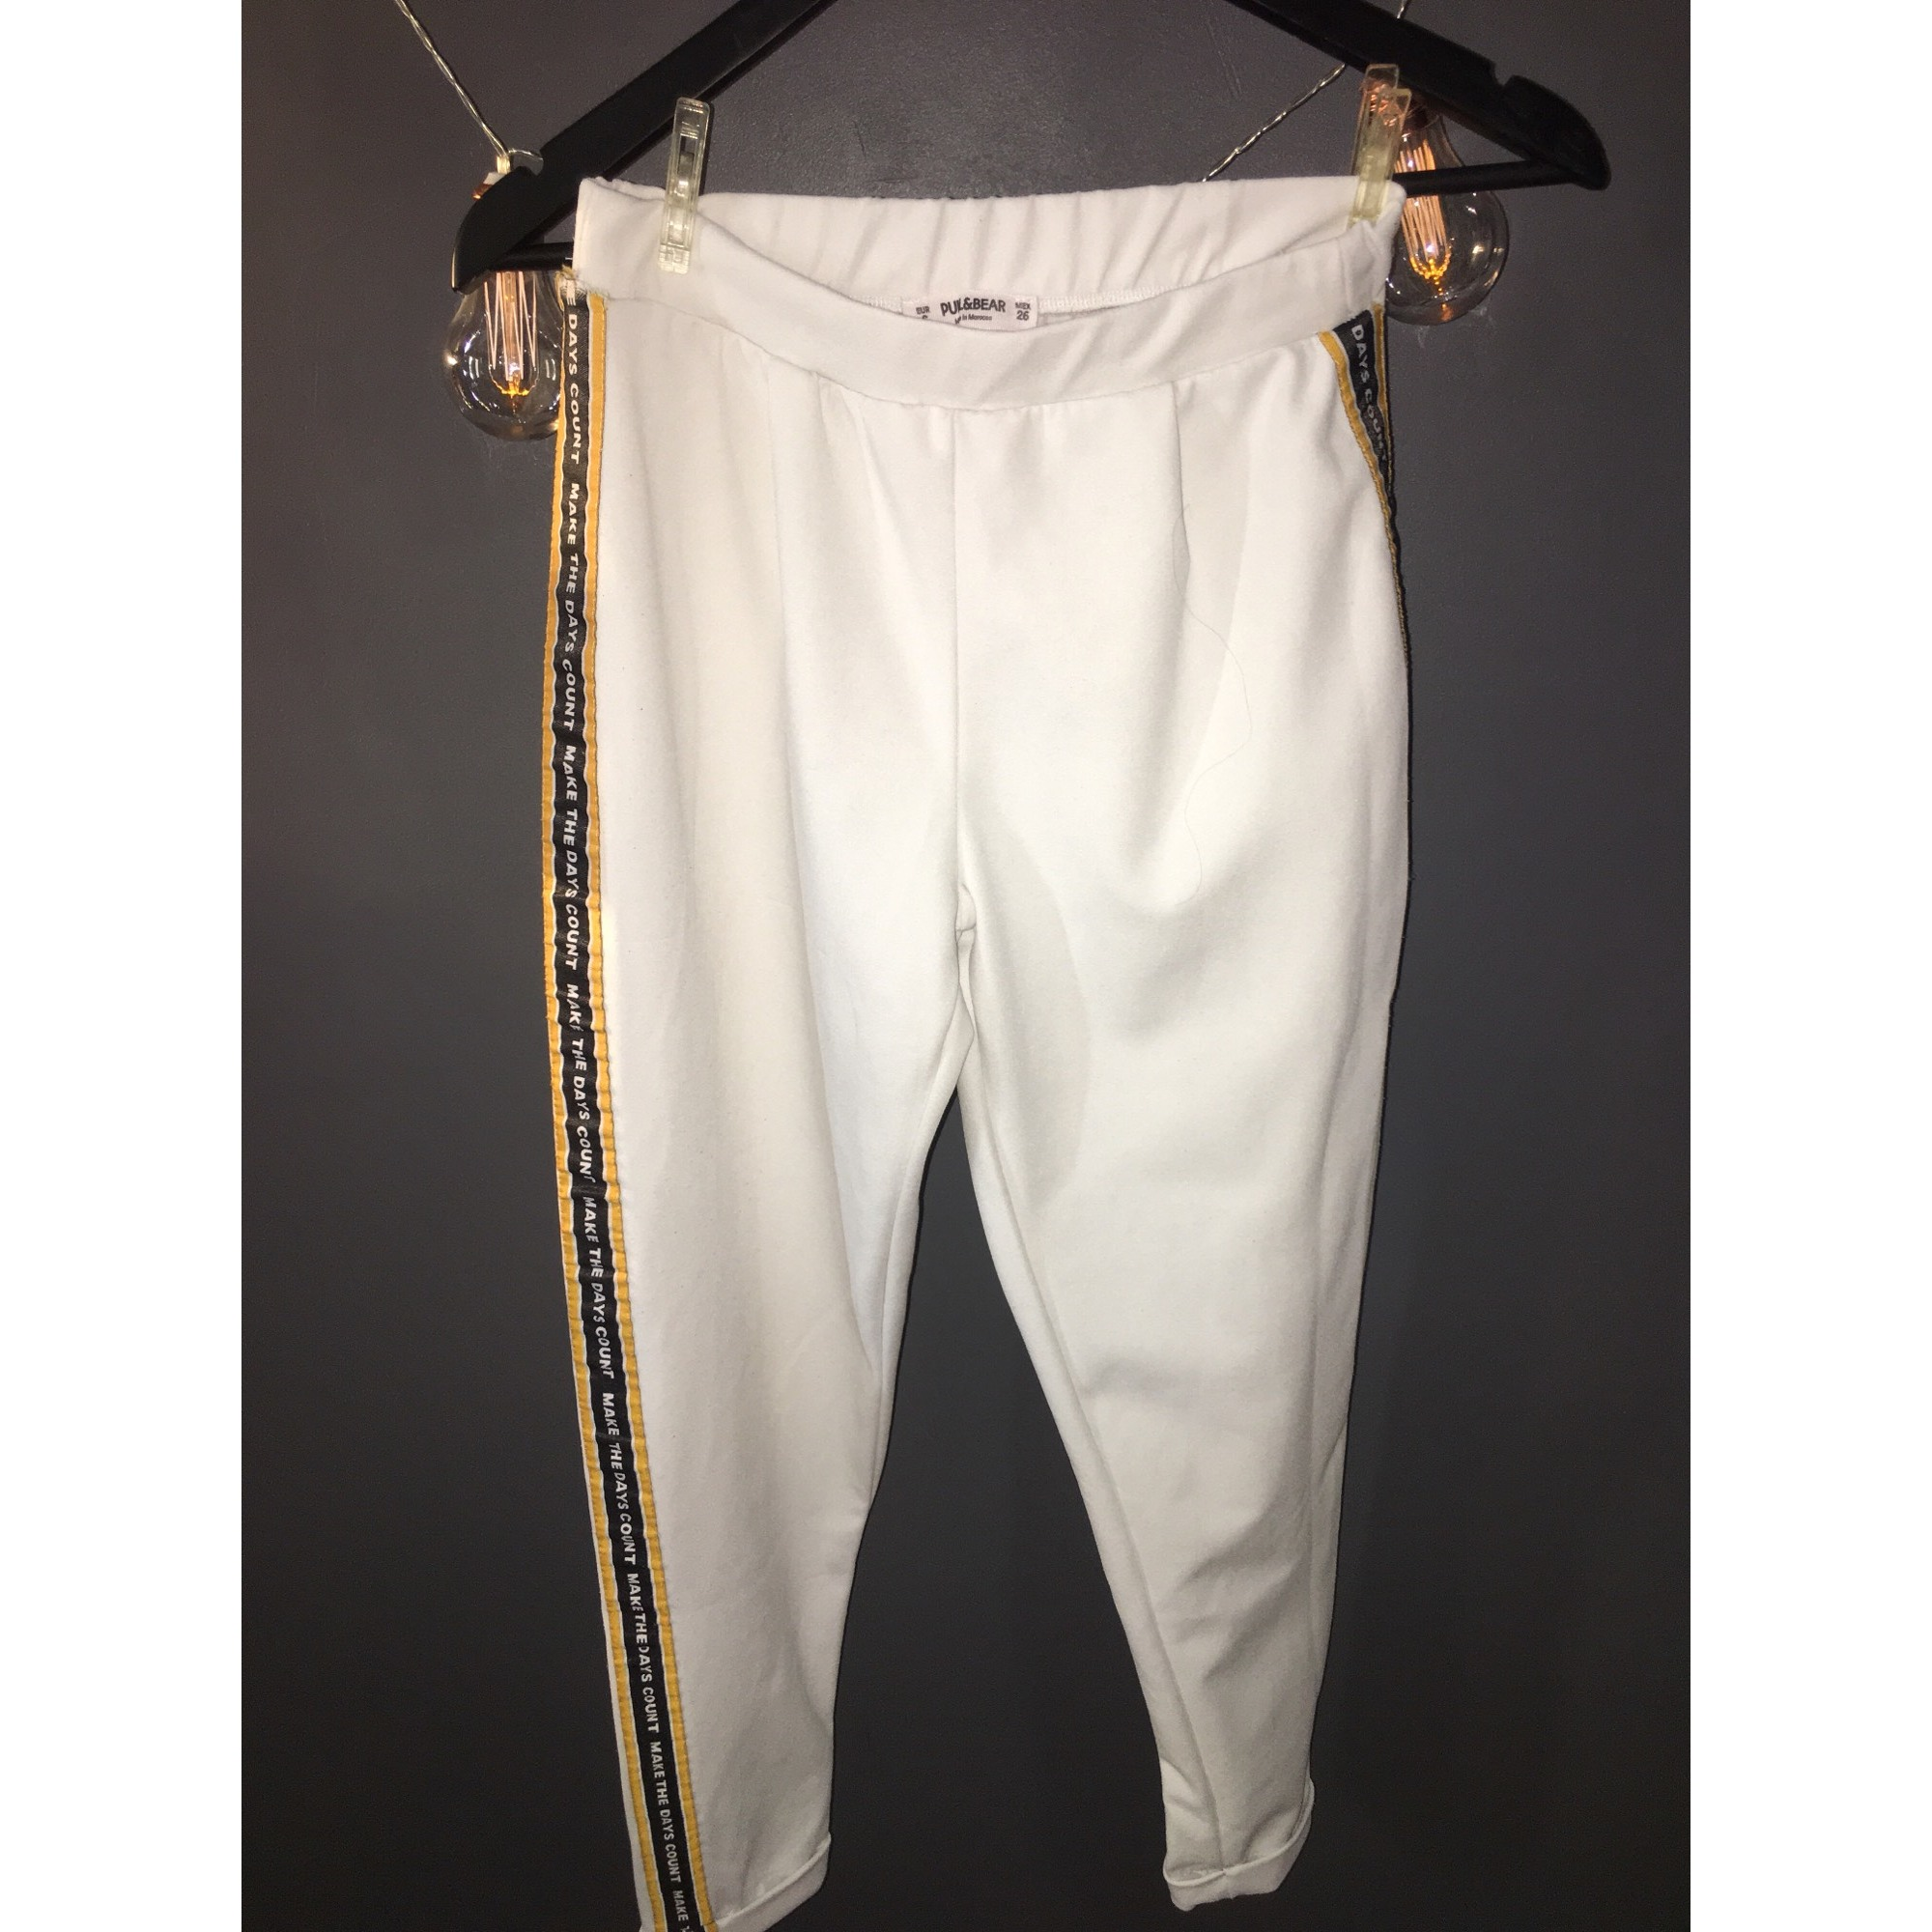 Pantalon slim, cigarette PULL & BEAR Blanc, blanc cassé, écru